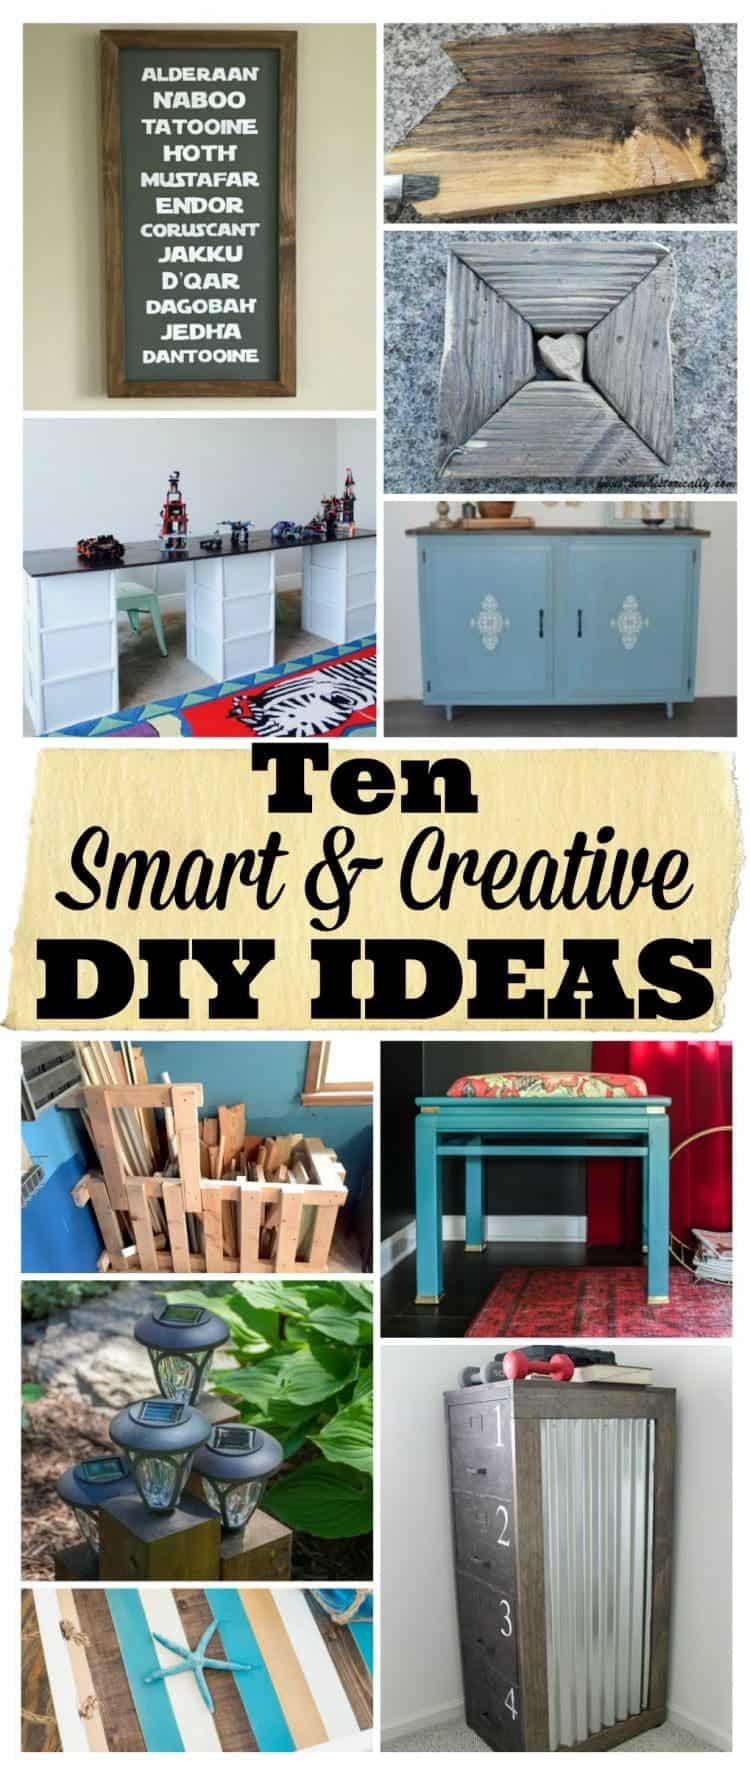 10 Smart and Creative DIY Ideas